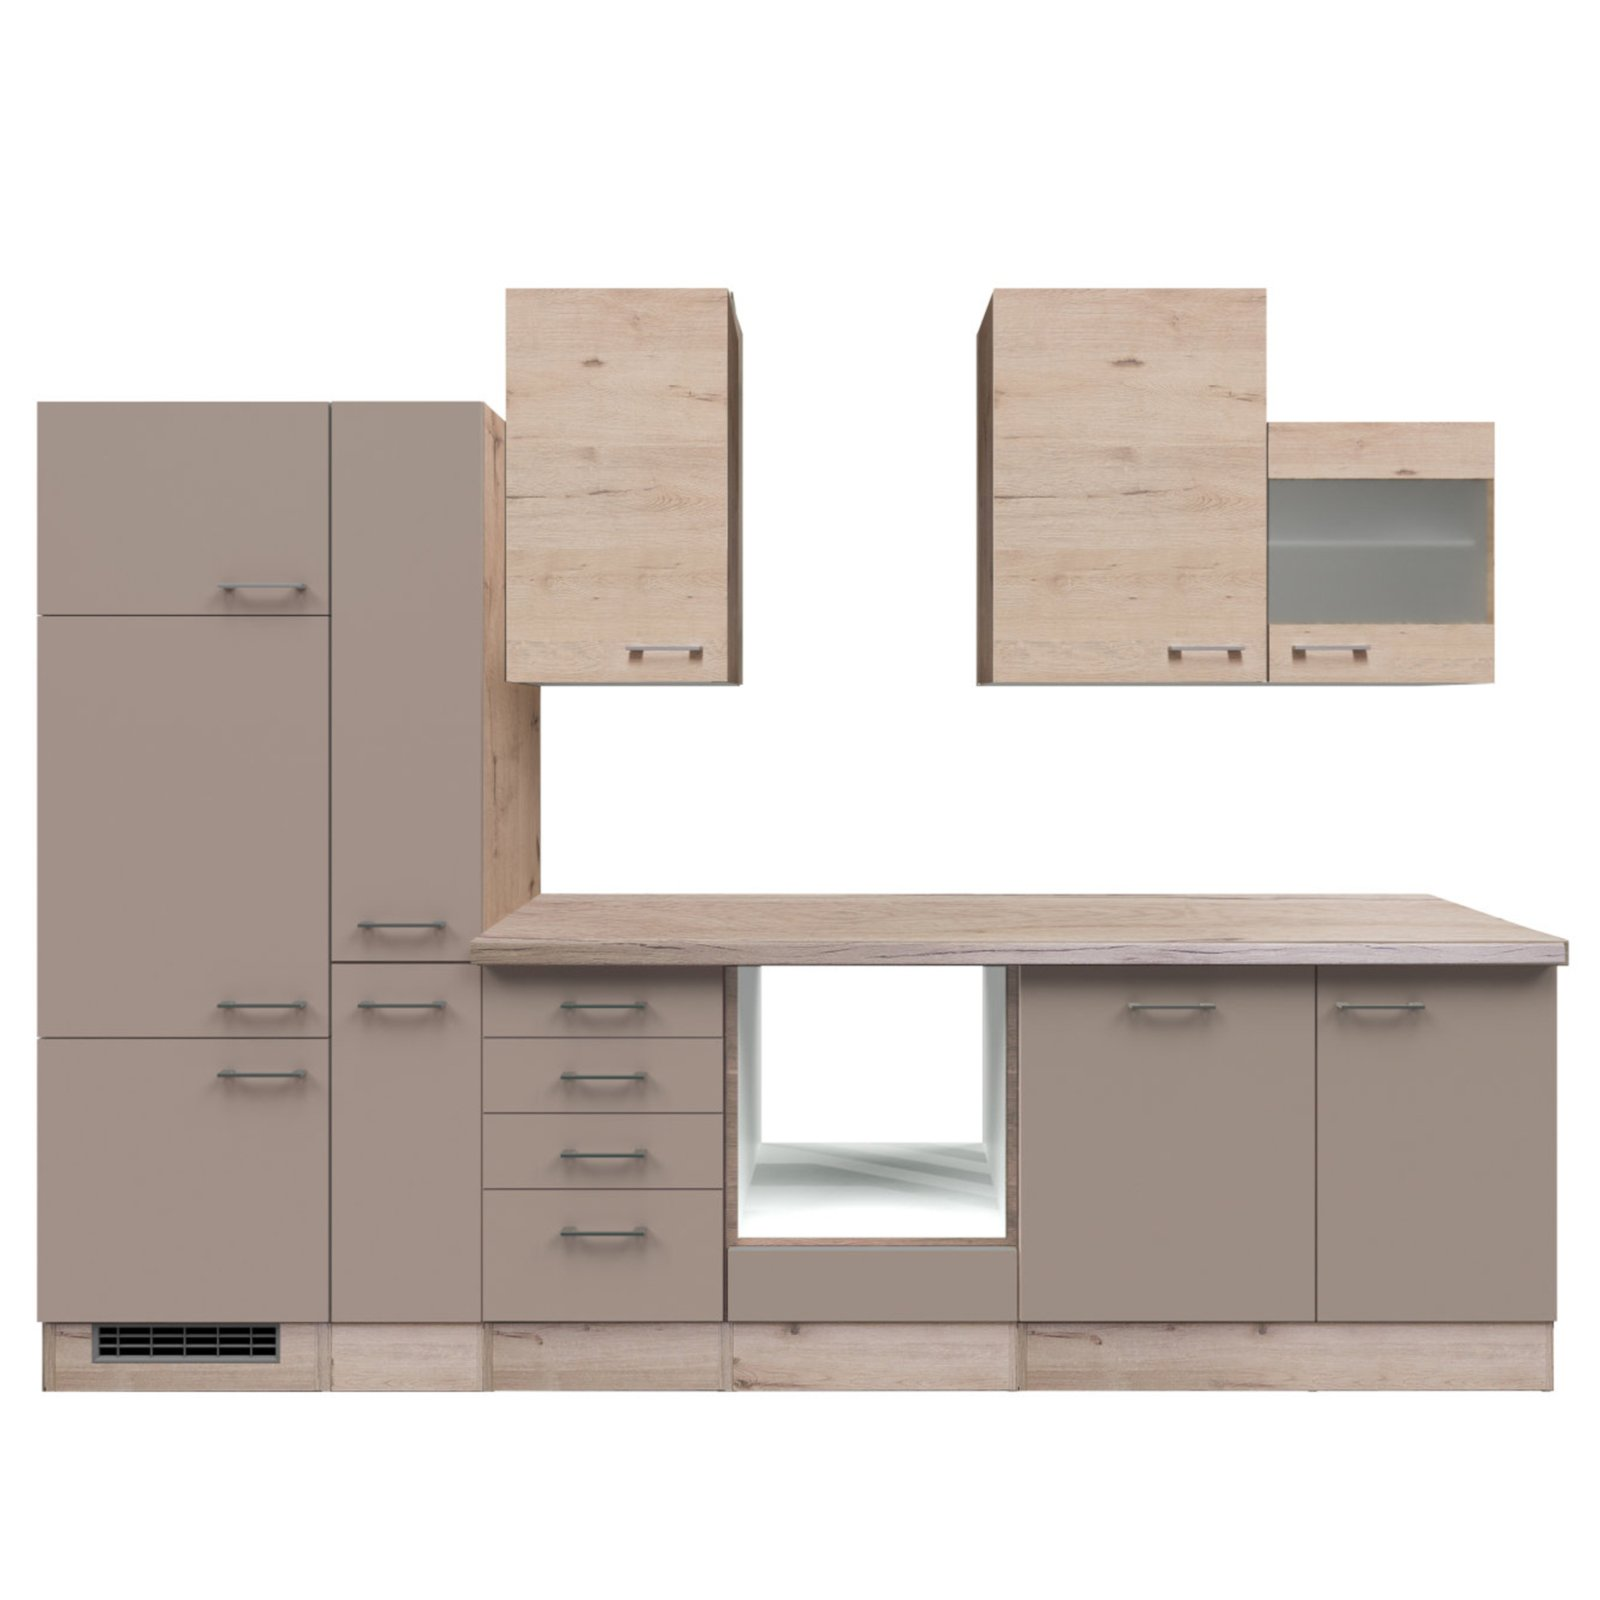 k chenblock riva quarz cubanit san remo eiche 310 cm. Black Bedroom Furniture Sets. Home Design Ideas